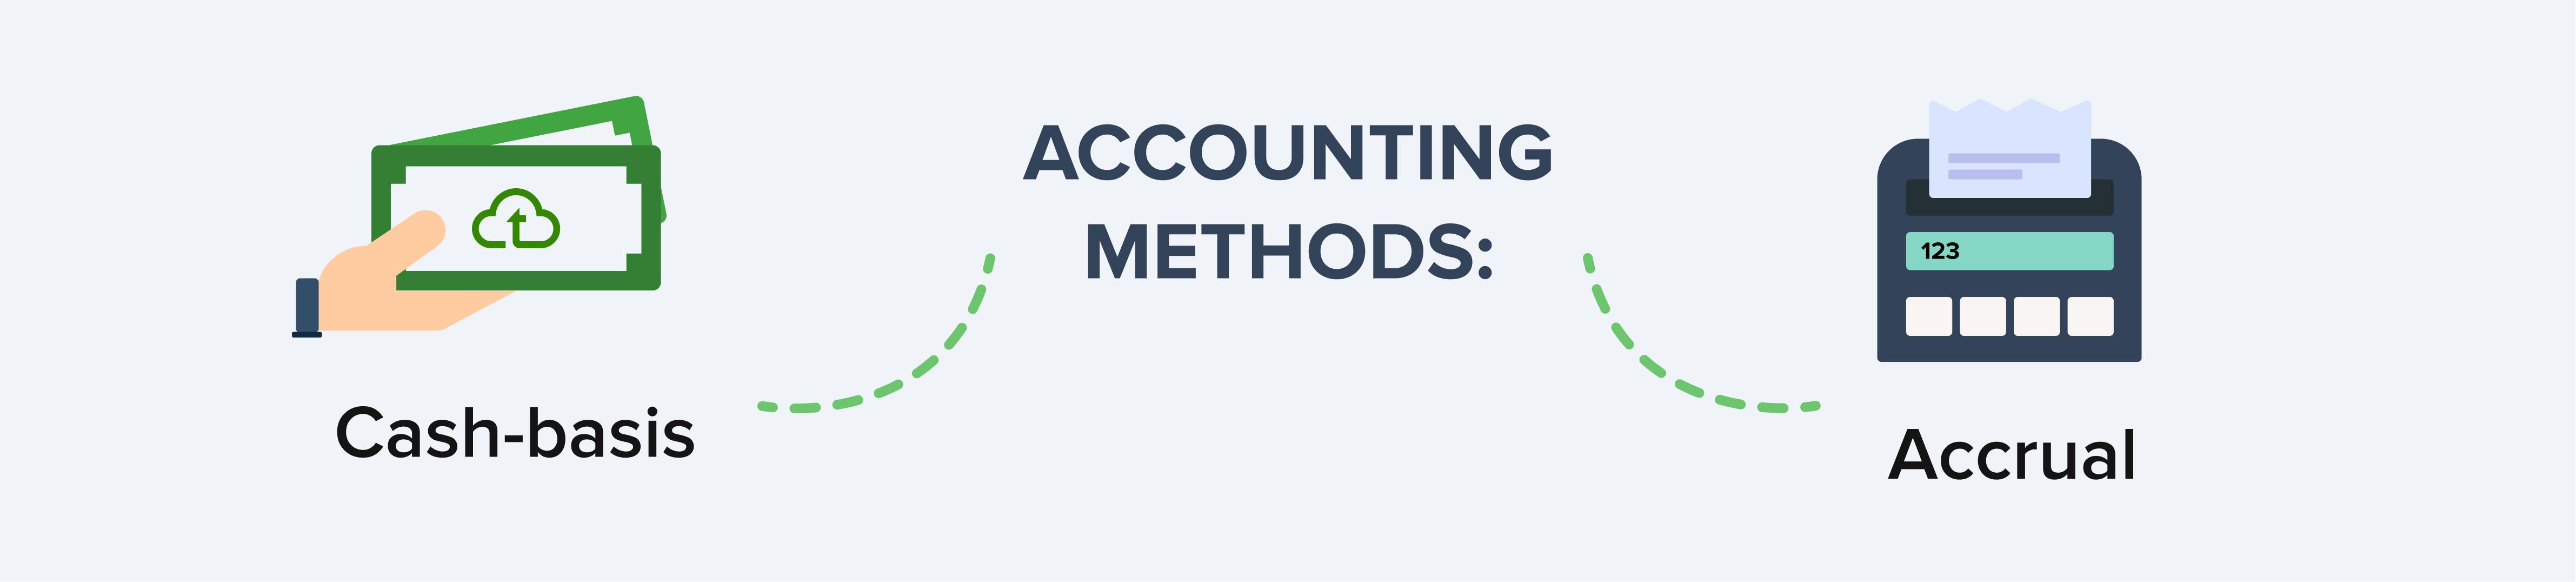 Accounting methods